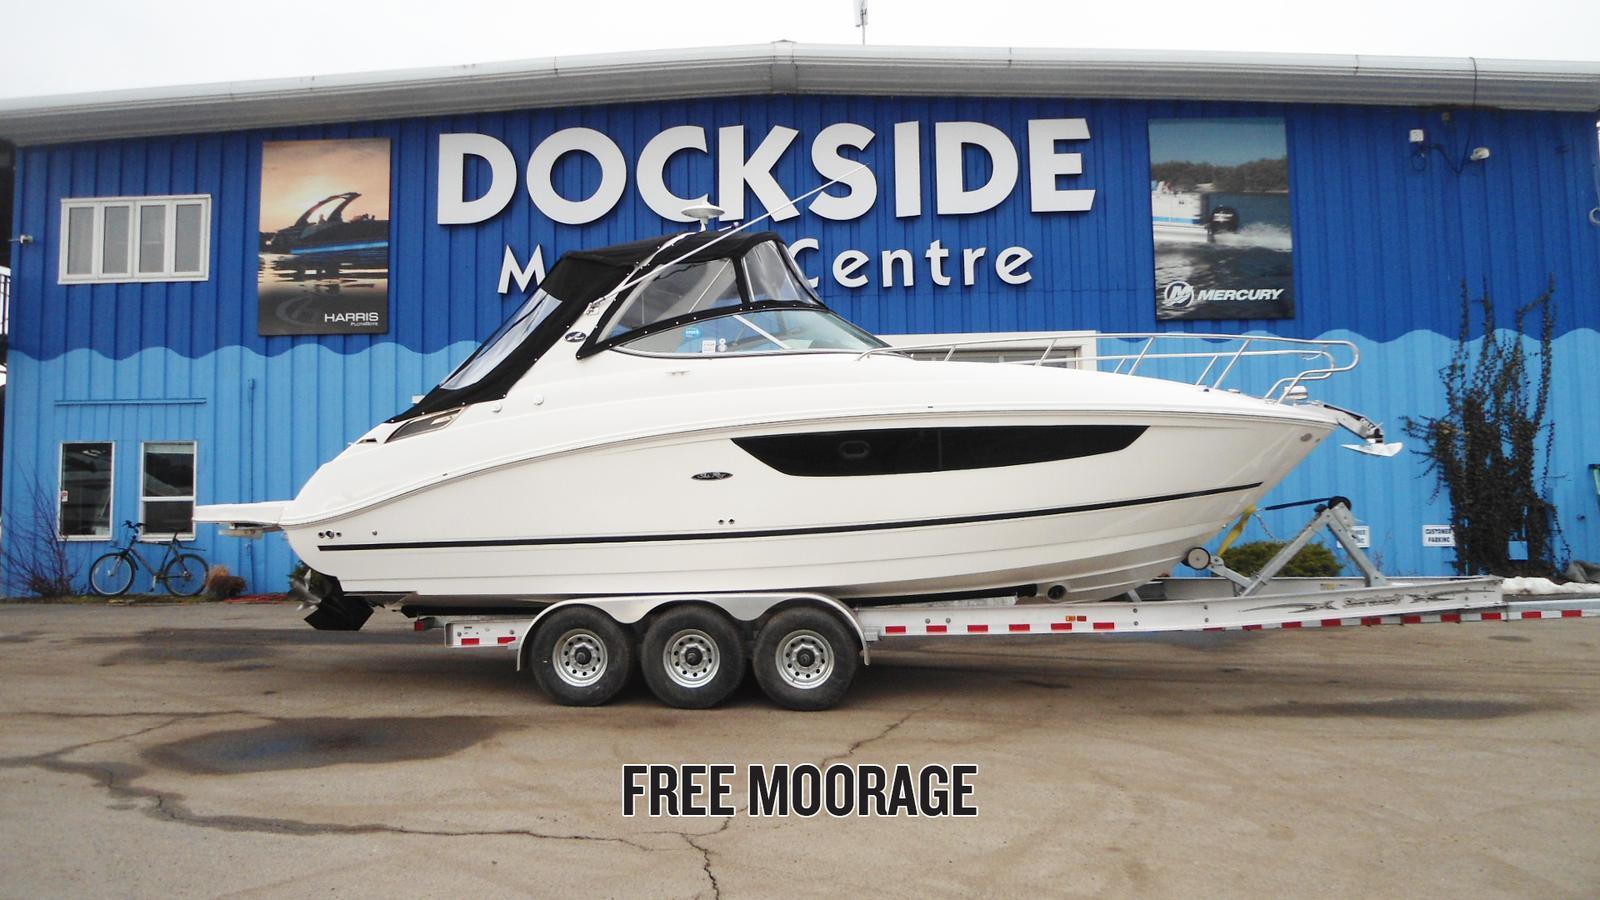 For Sale: 2017 Sea Ray 280 Sundancer 29ft<br/>Dockside Marine Centre, LTD.